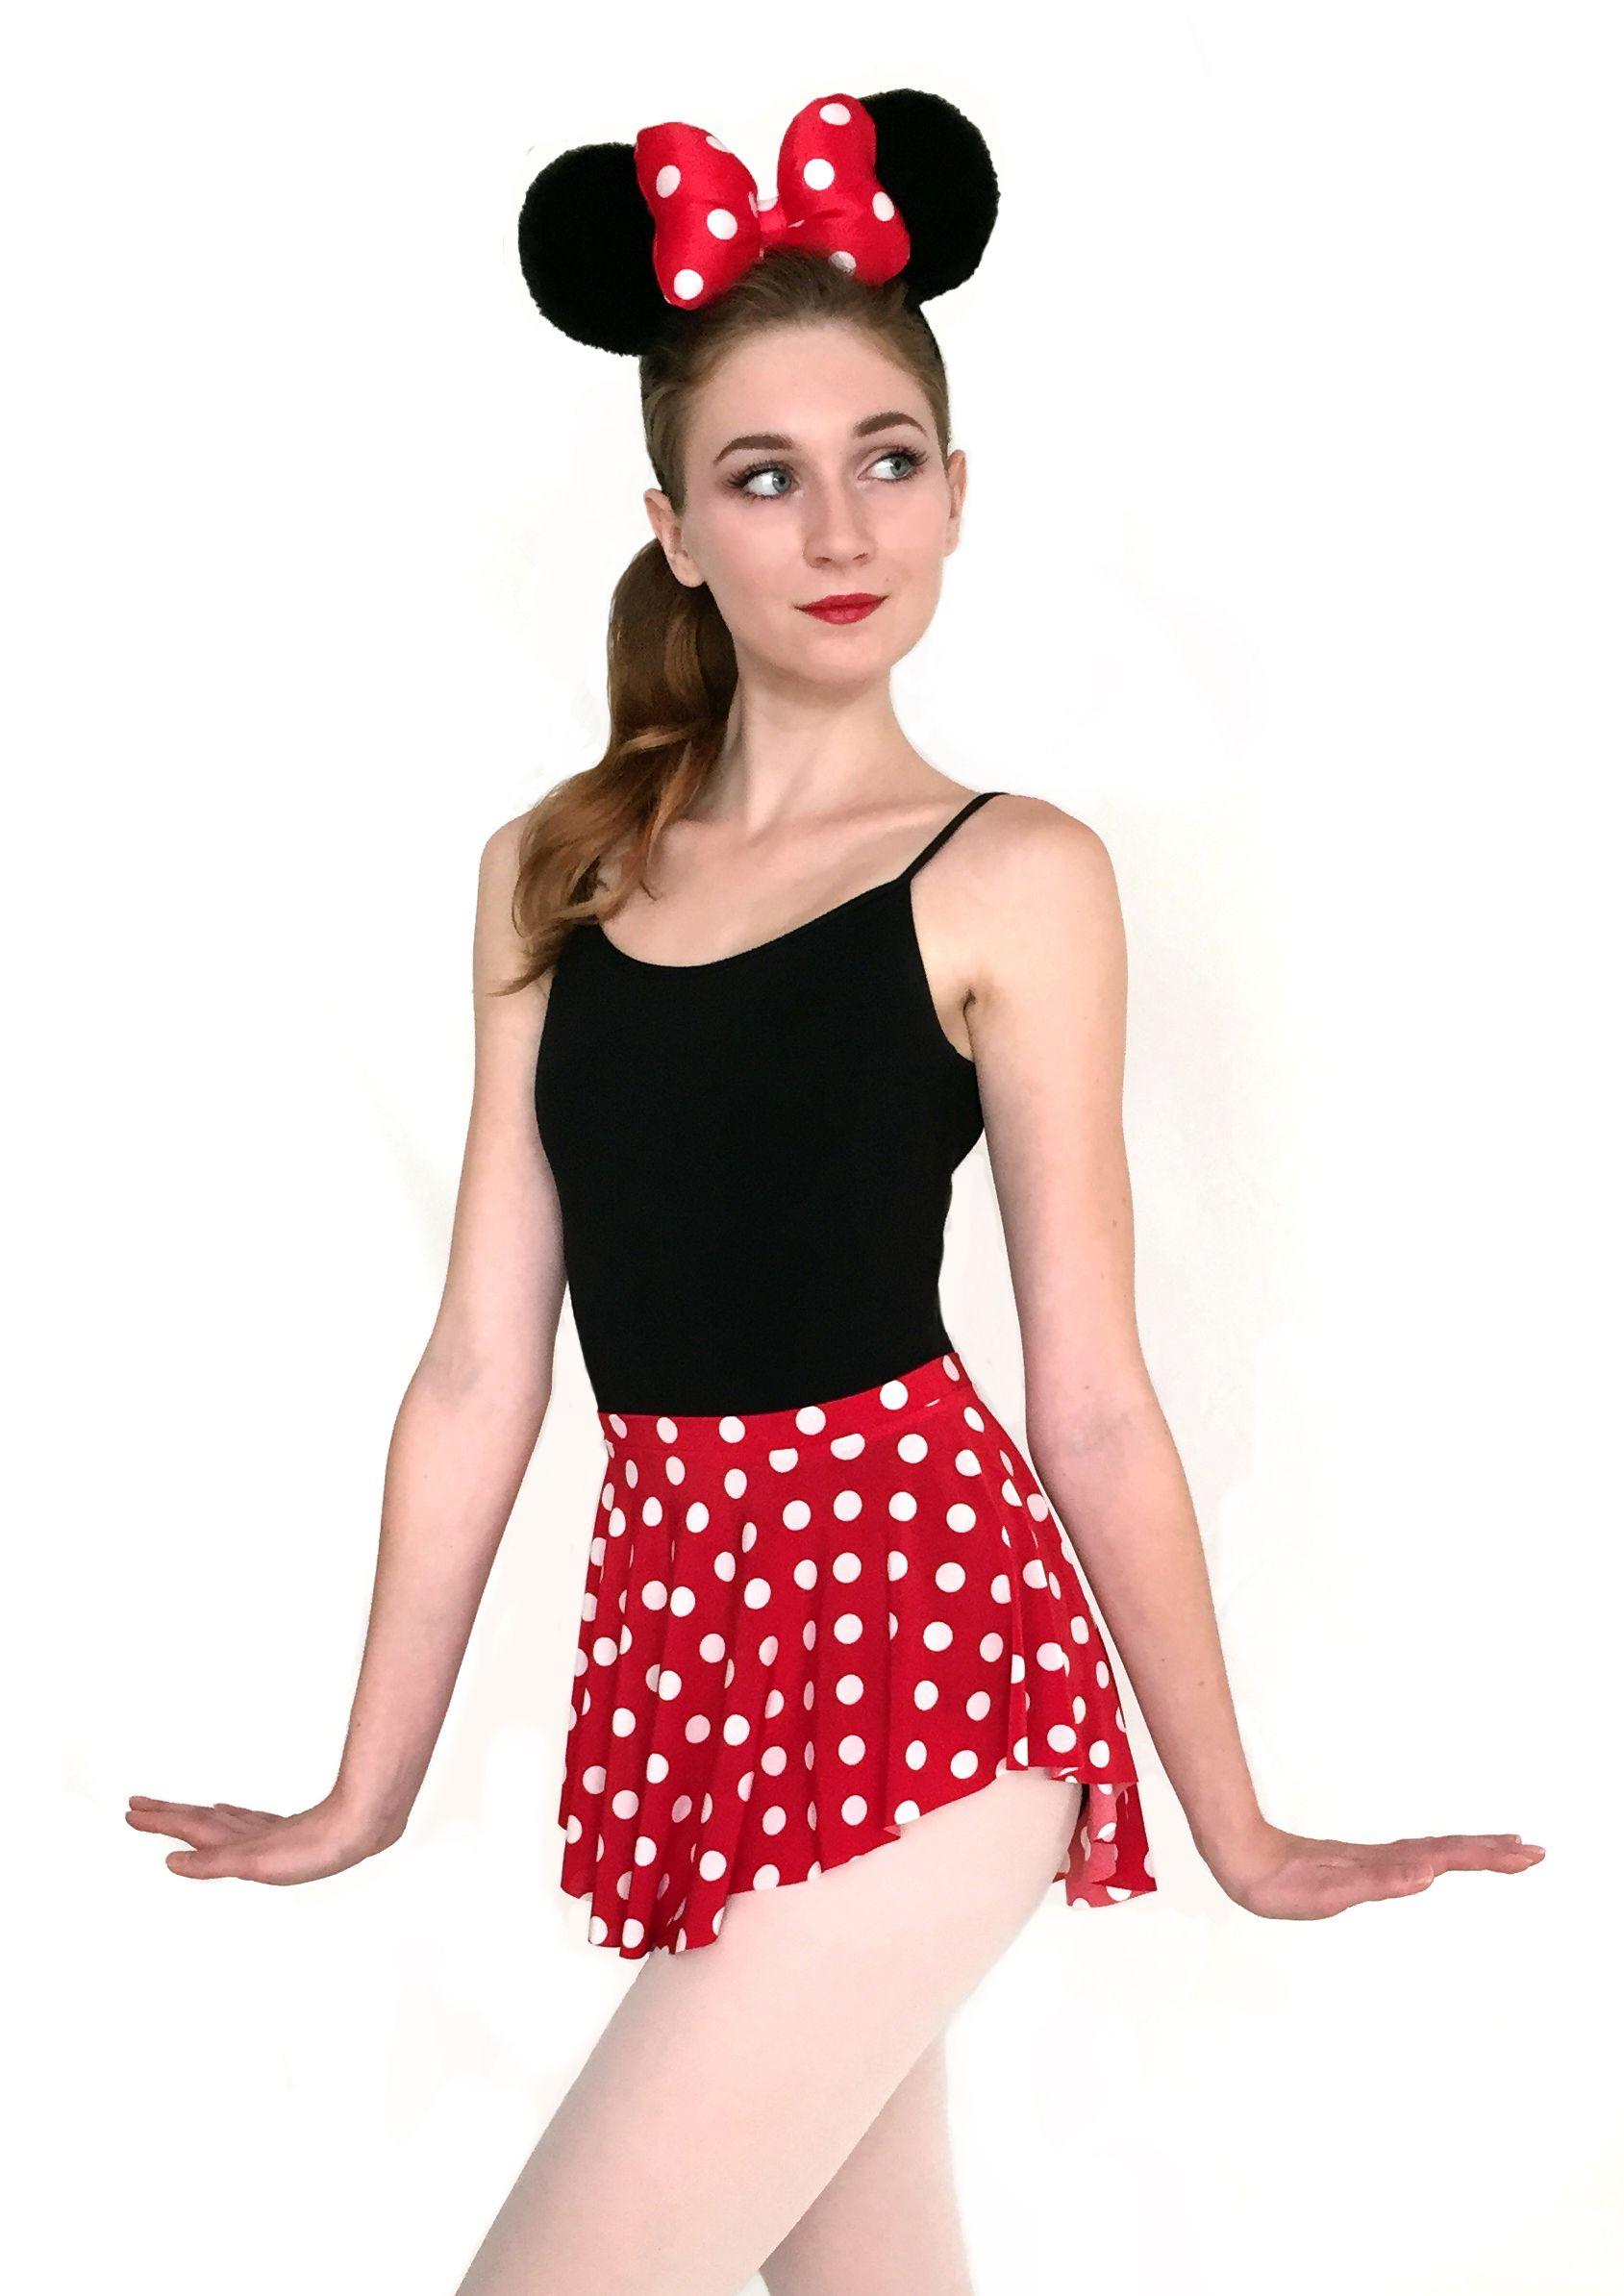 742d54d1bab9 CUTE! Minnie Mouse polka dot skirt